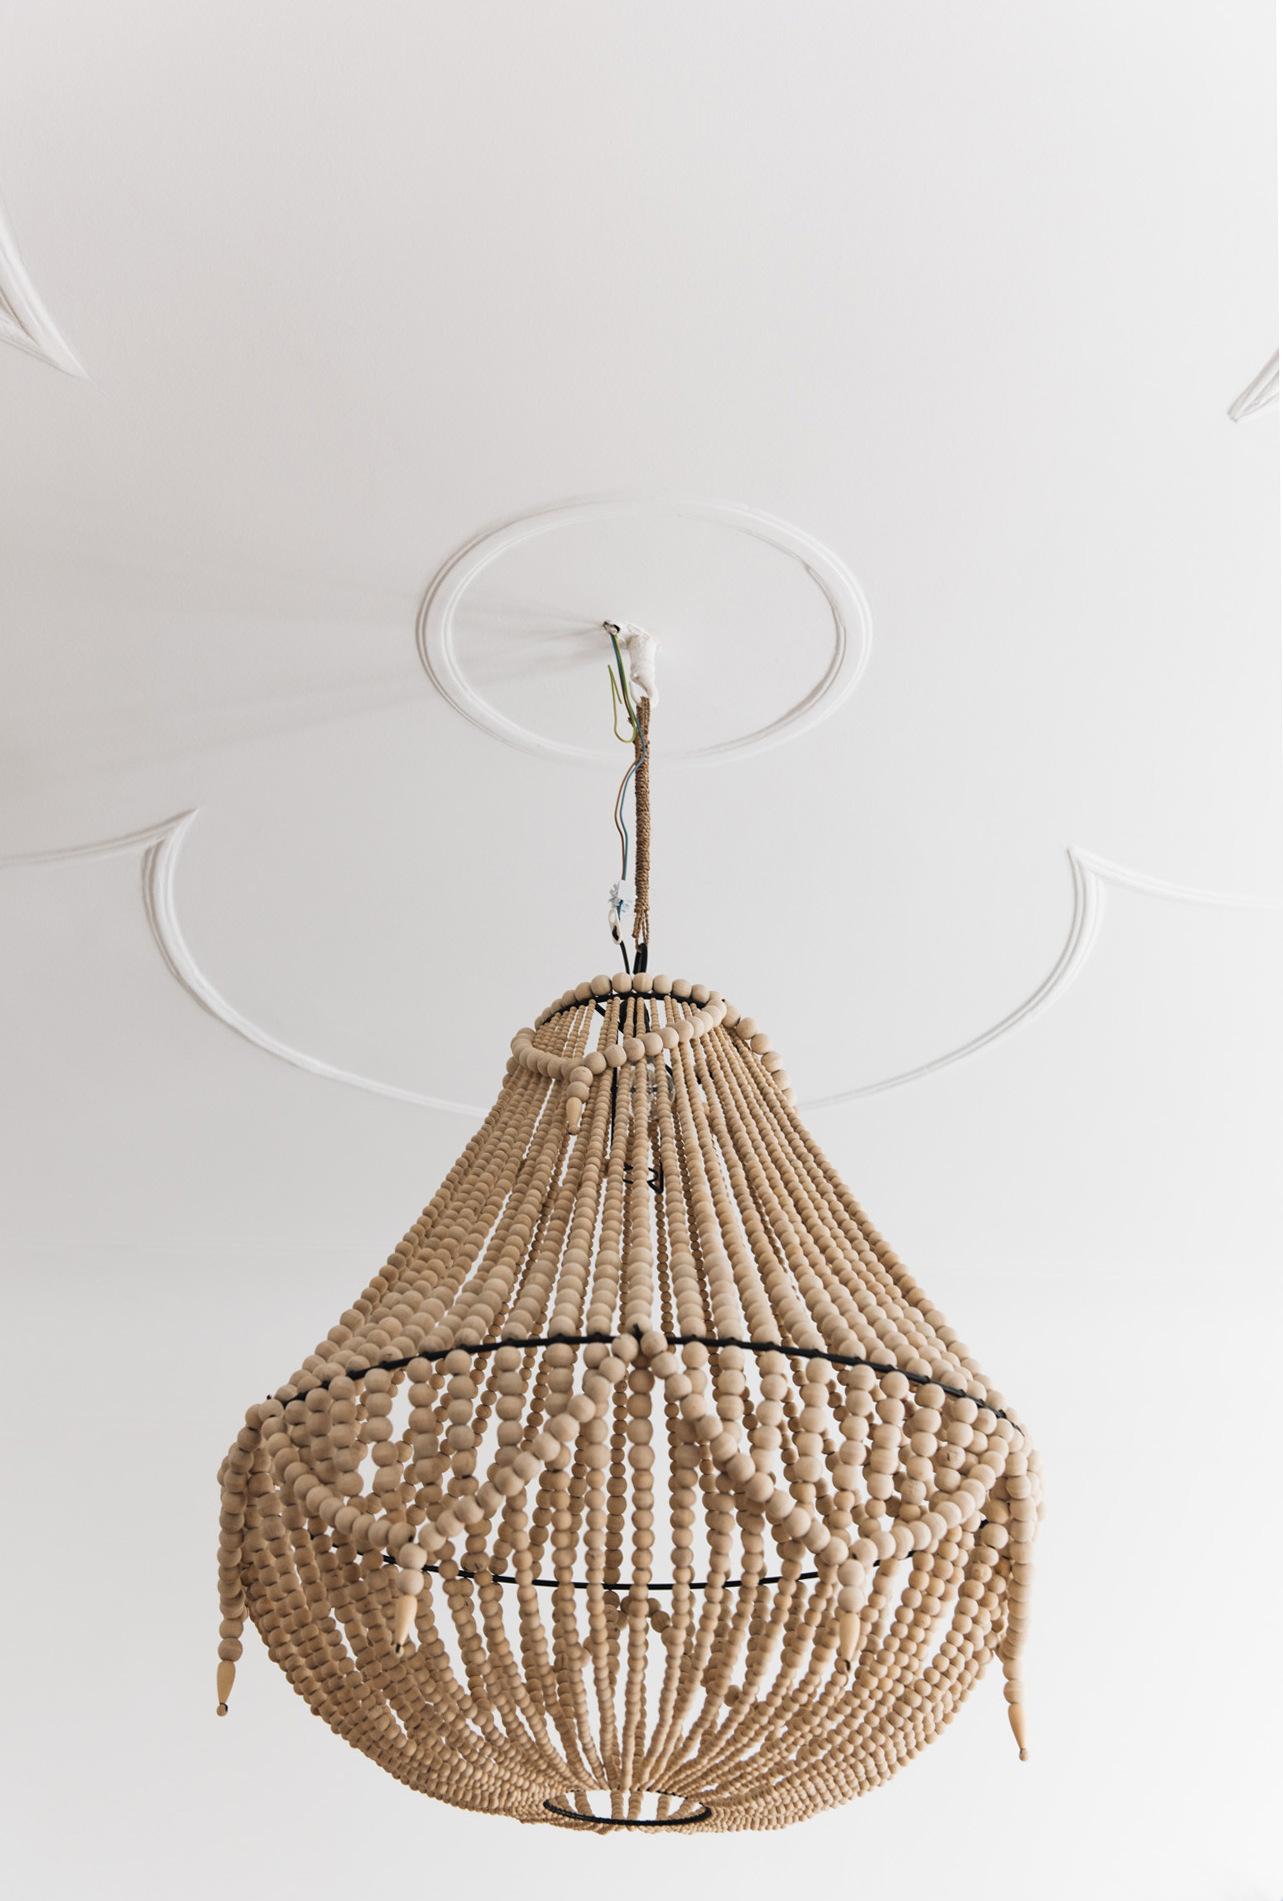 holz-kronleuchter-wood-chandelier-nina-schwichtenberg-fashiioncarpet